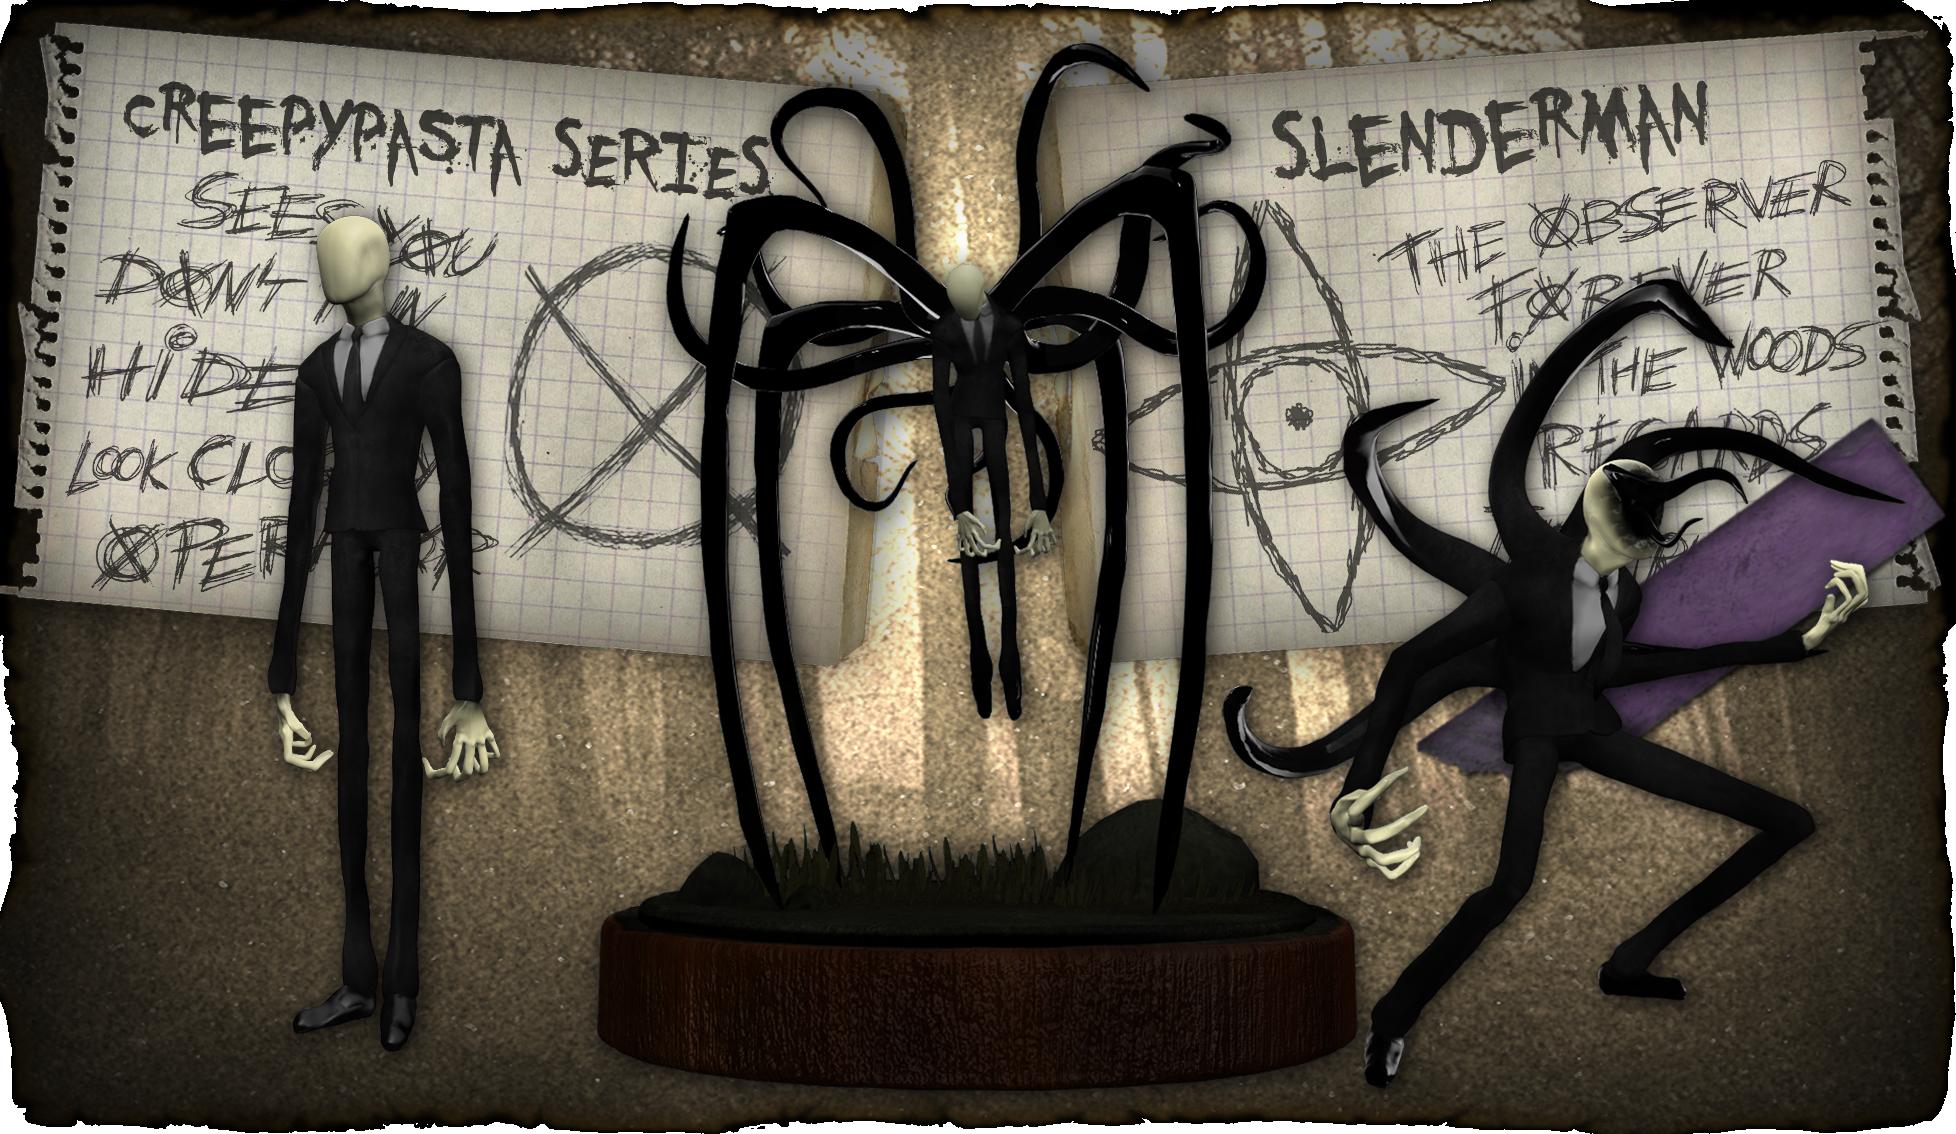 Resultado de imagem para Creepypastas slenderman